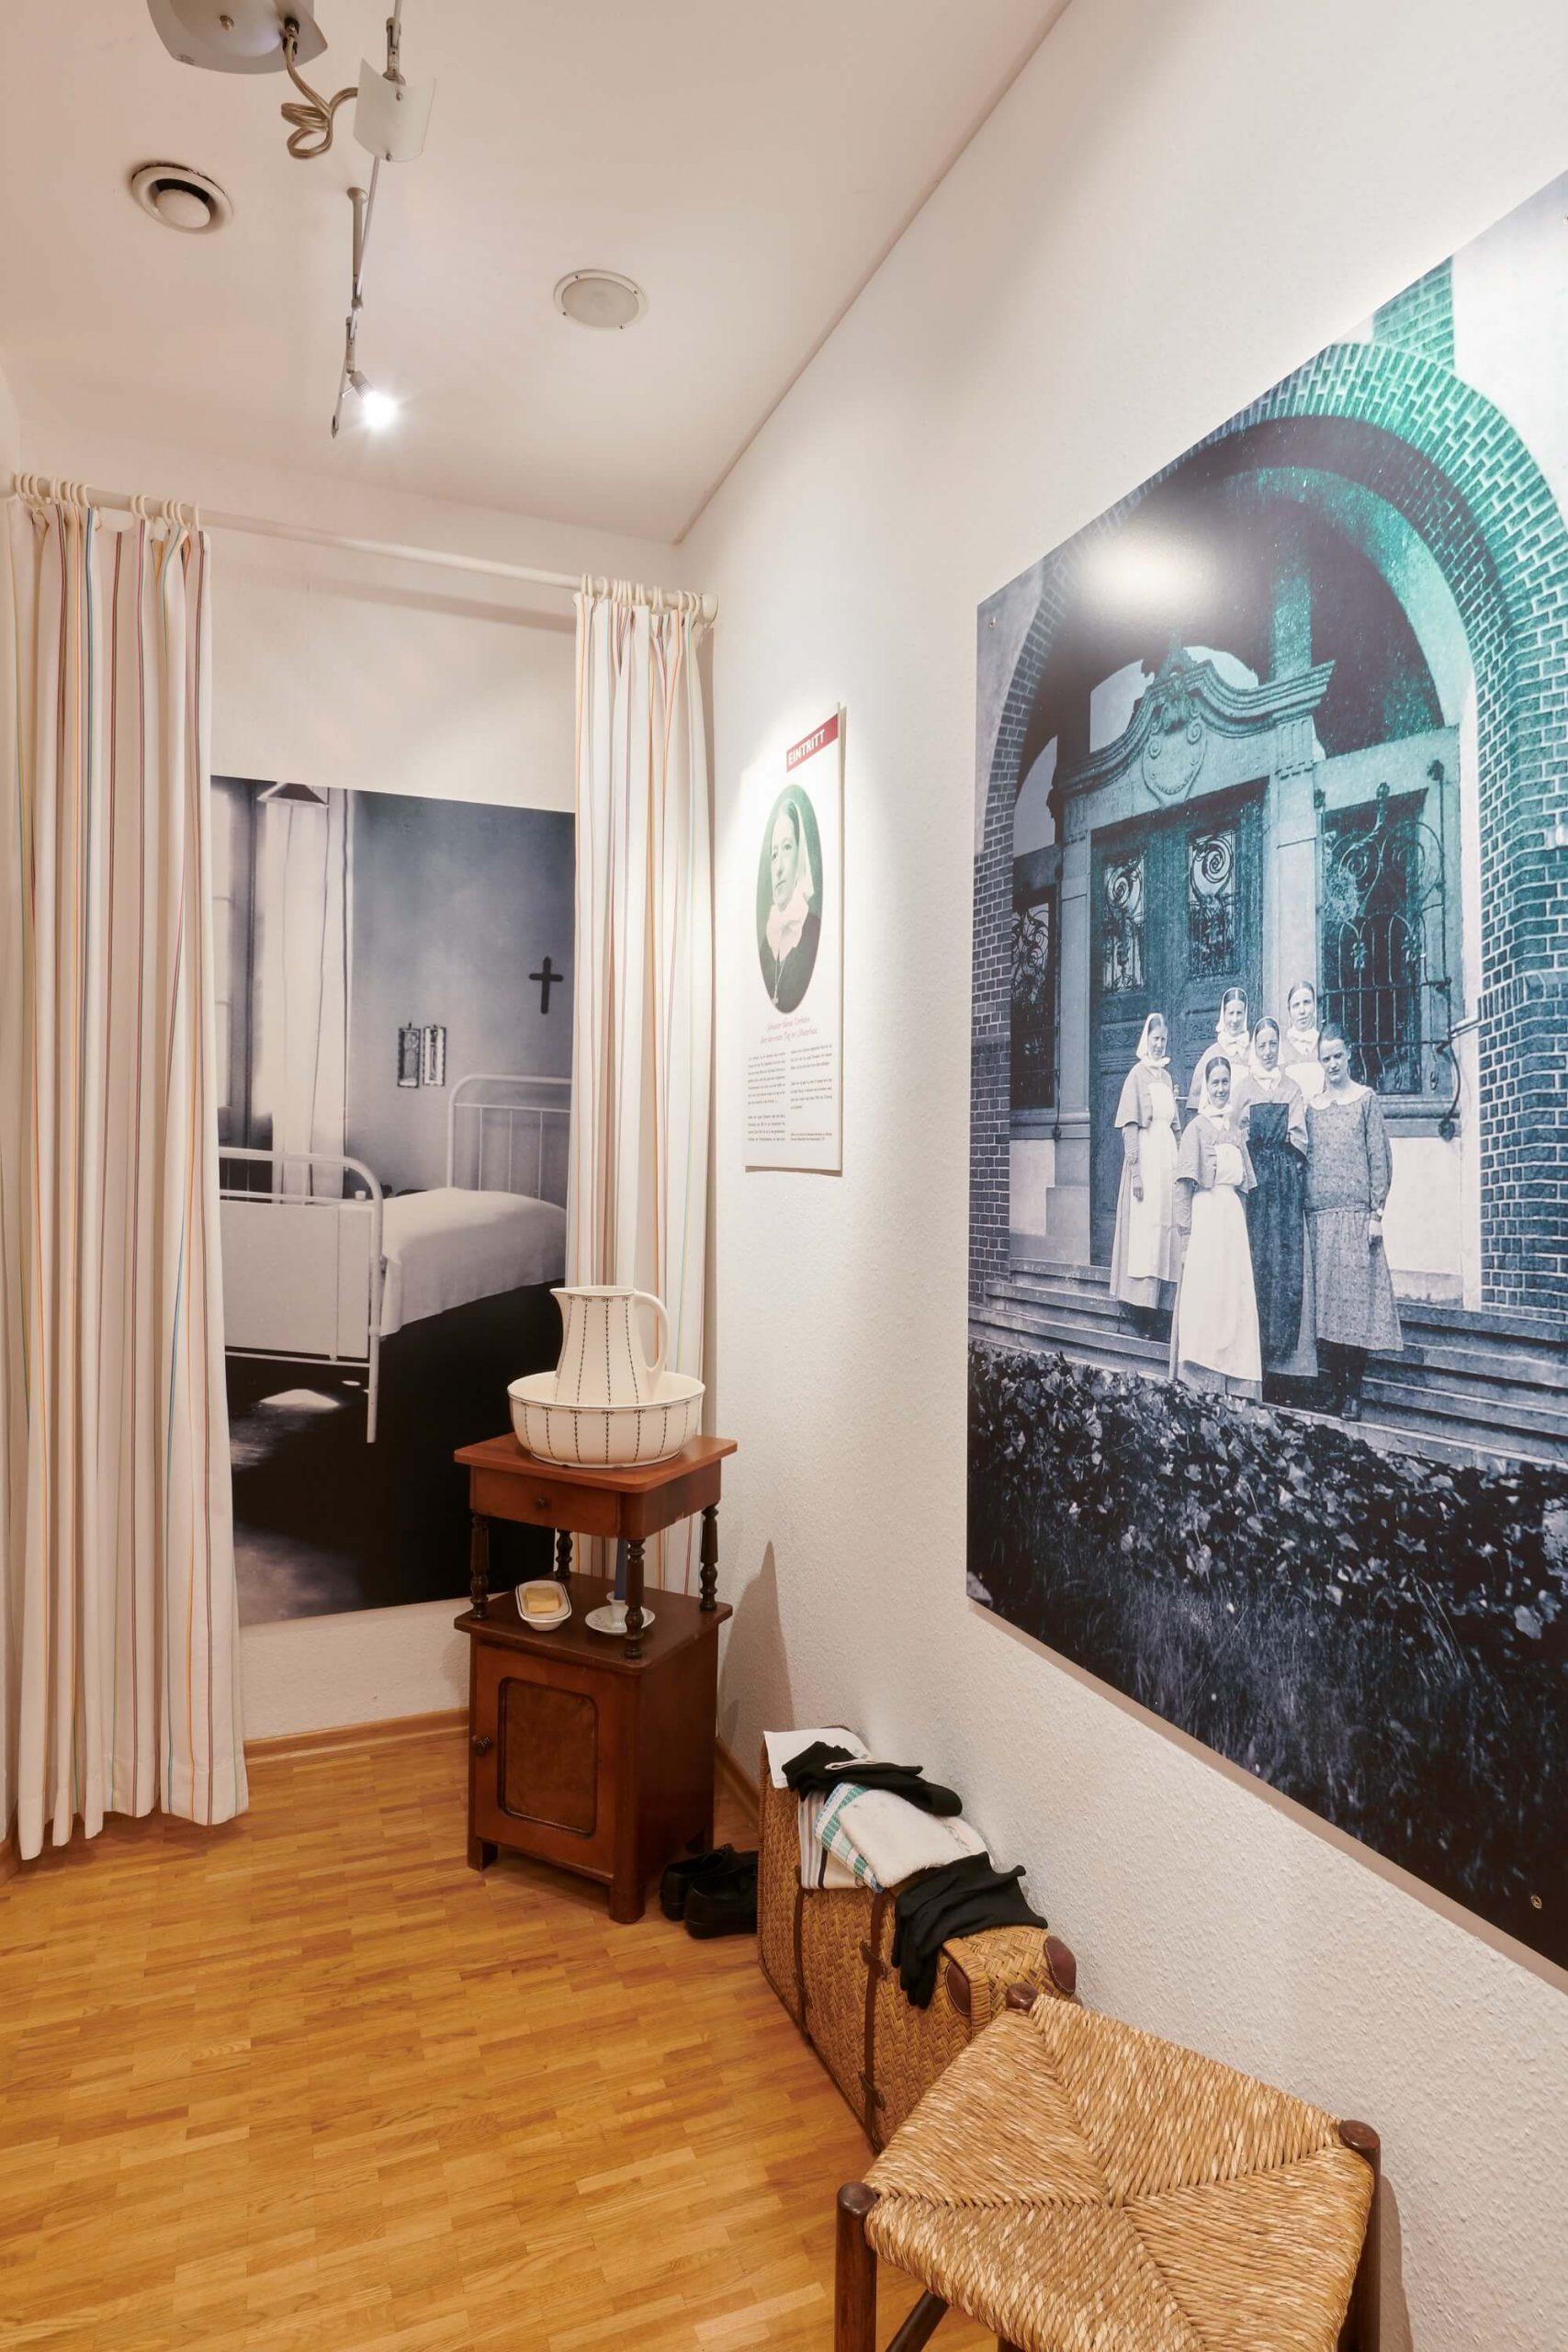 2020-01-30-Mutterhaus-Museum-hauke-mueller-fotografie_HMF5583